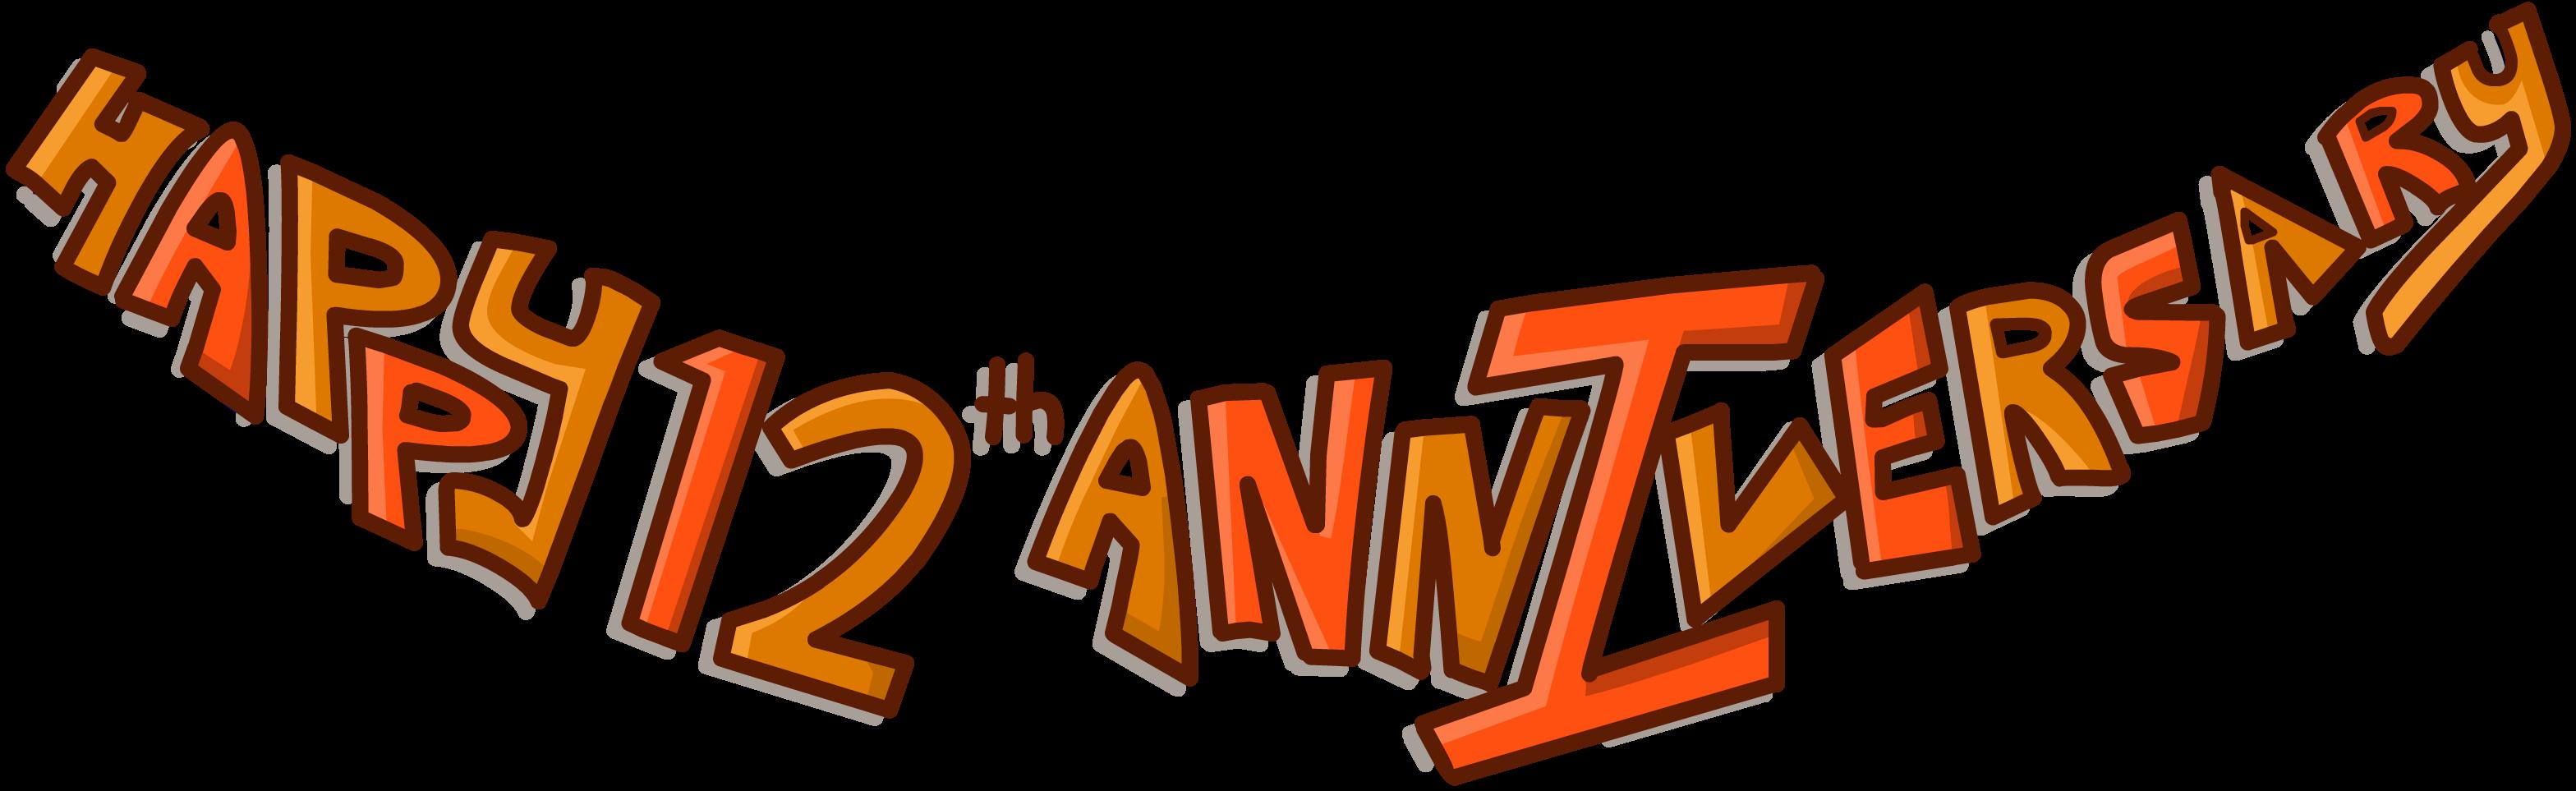 Anniversary Parties (disambiguation)